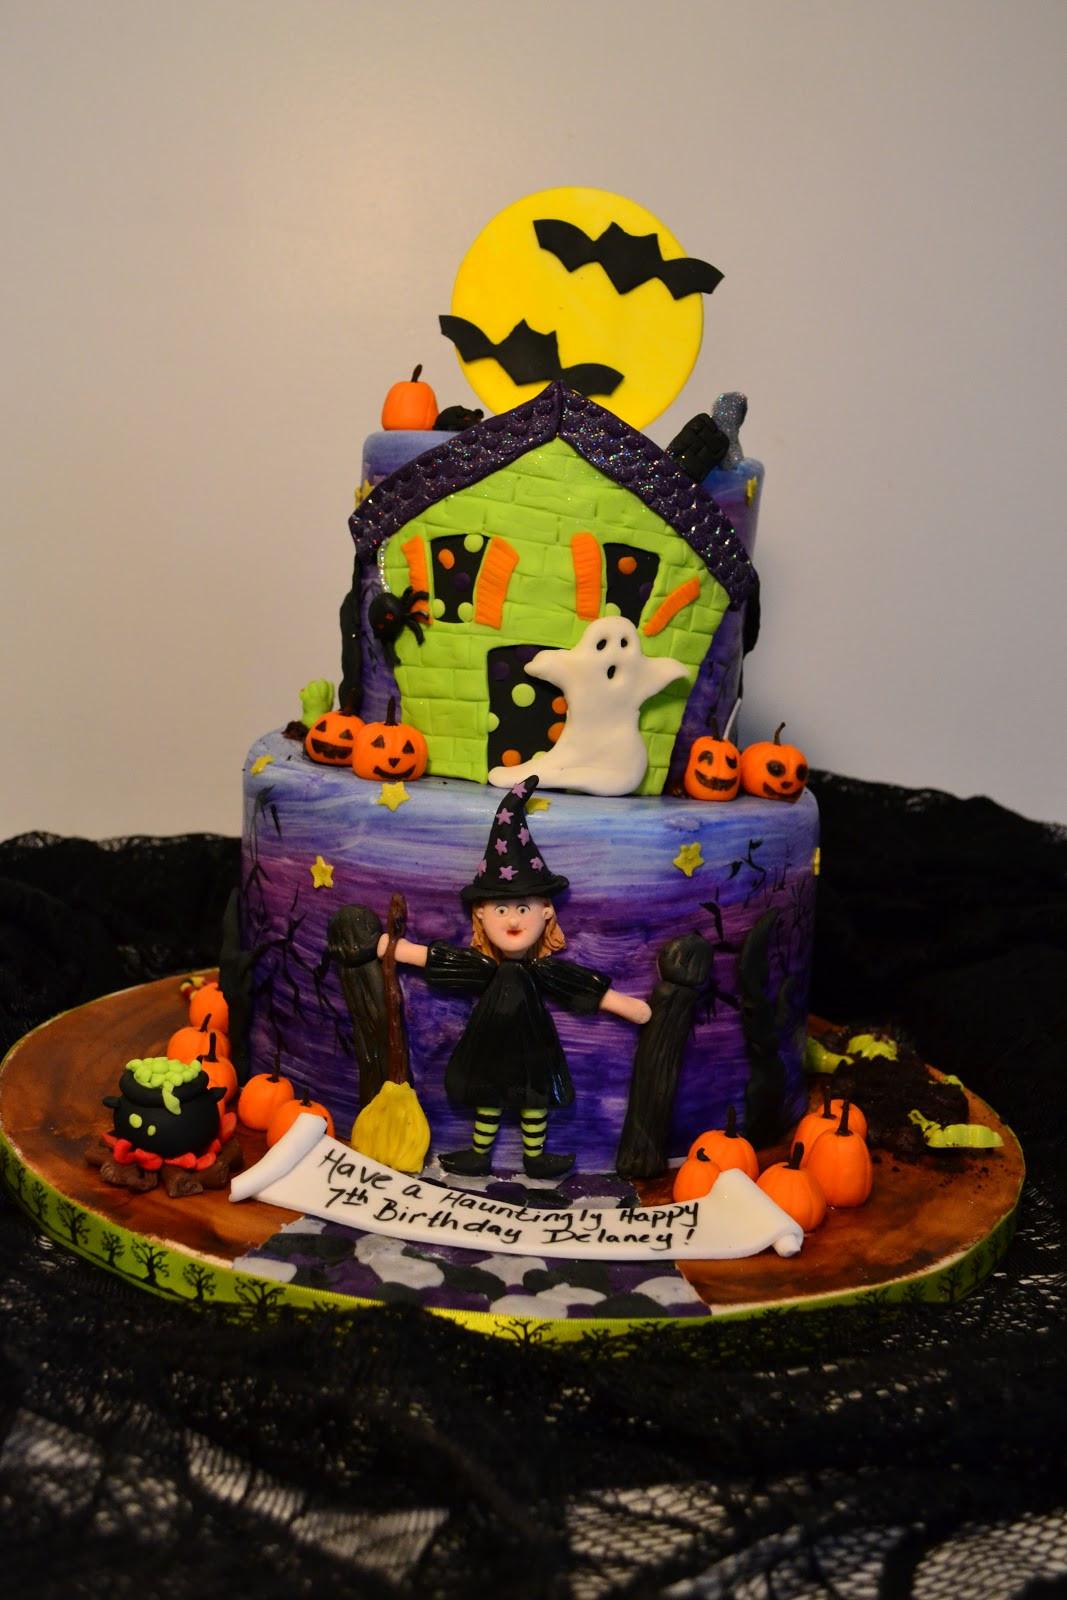 Halloween Birthday Cakes  Oh just put a cupcake in it Halloween birthday cake